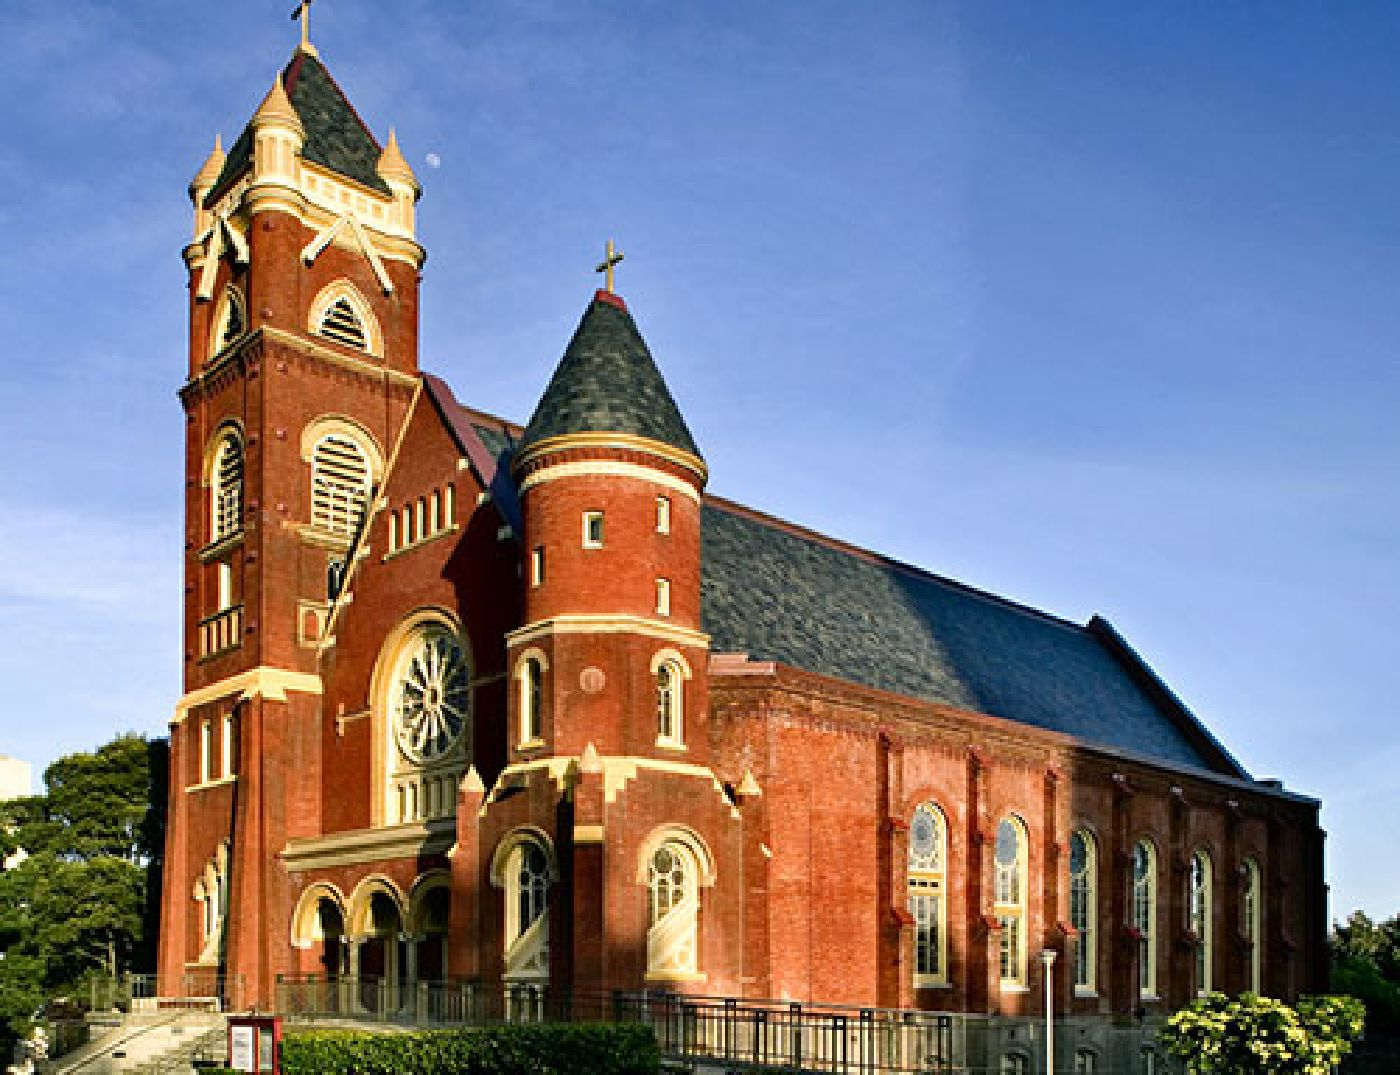 St. Mark's Luthern Church